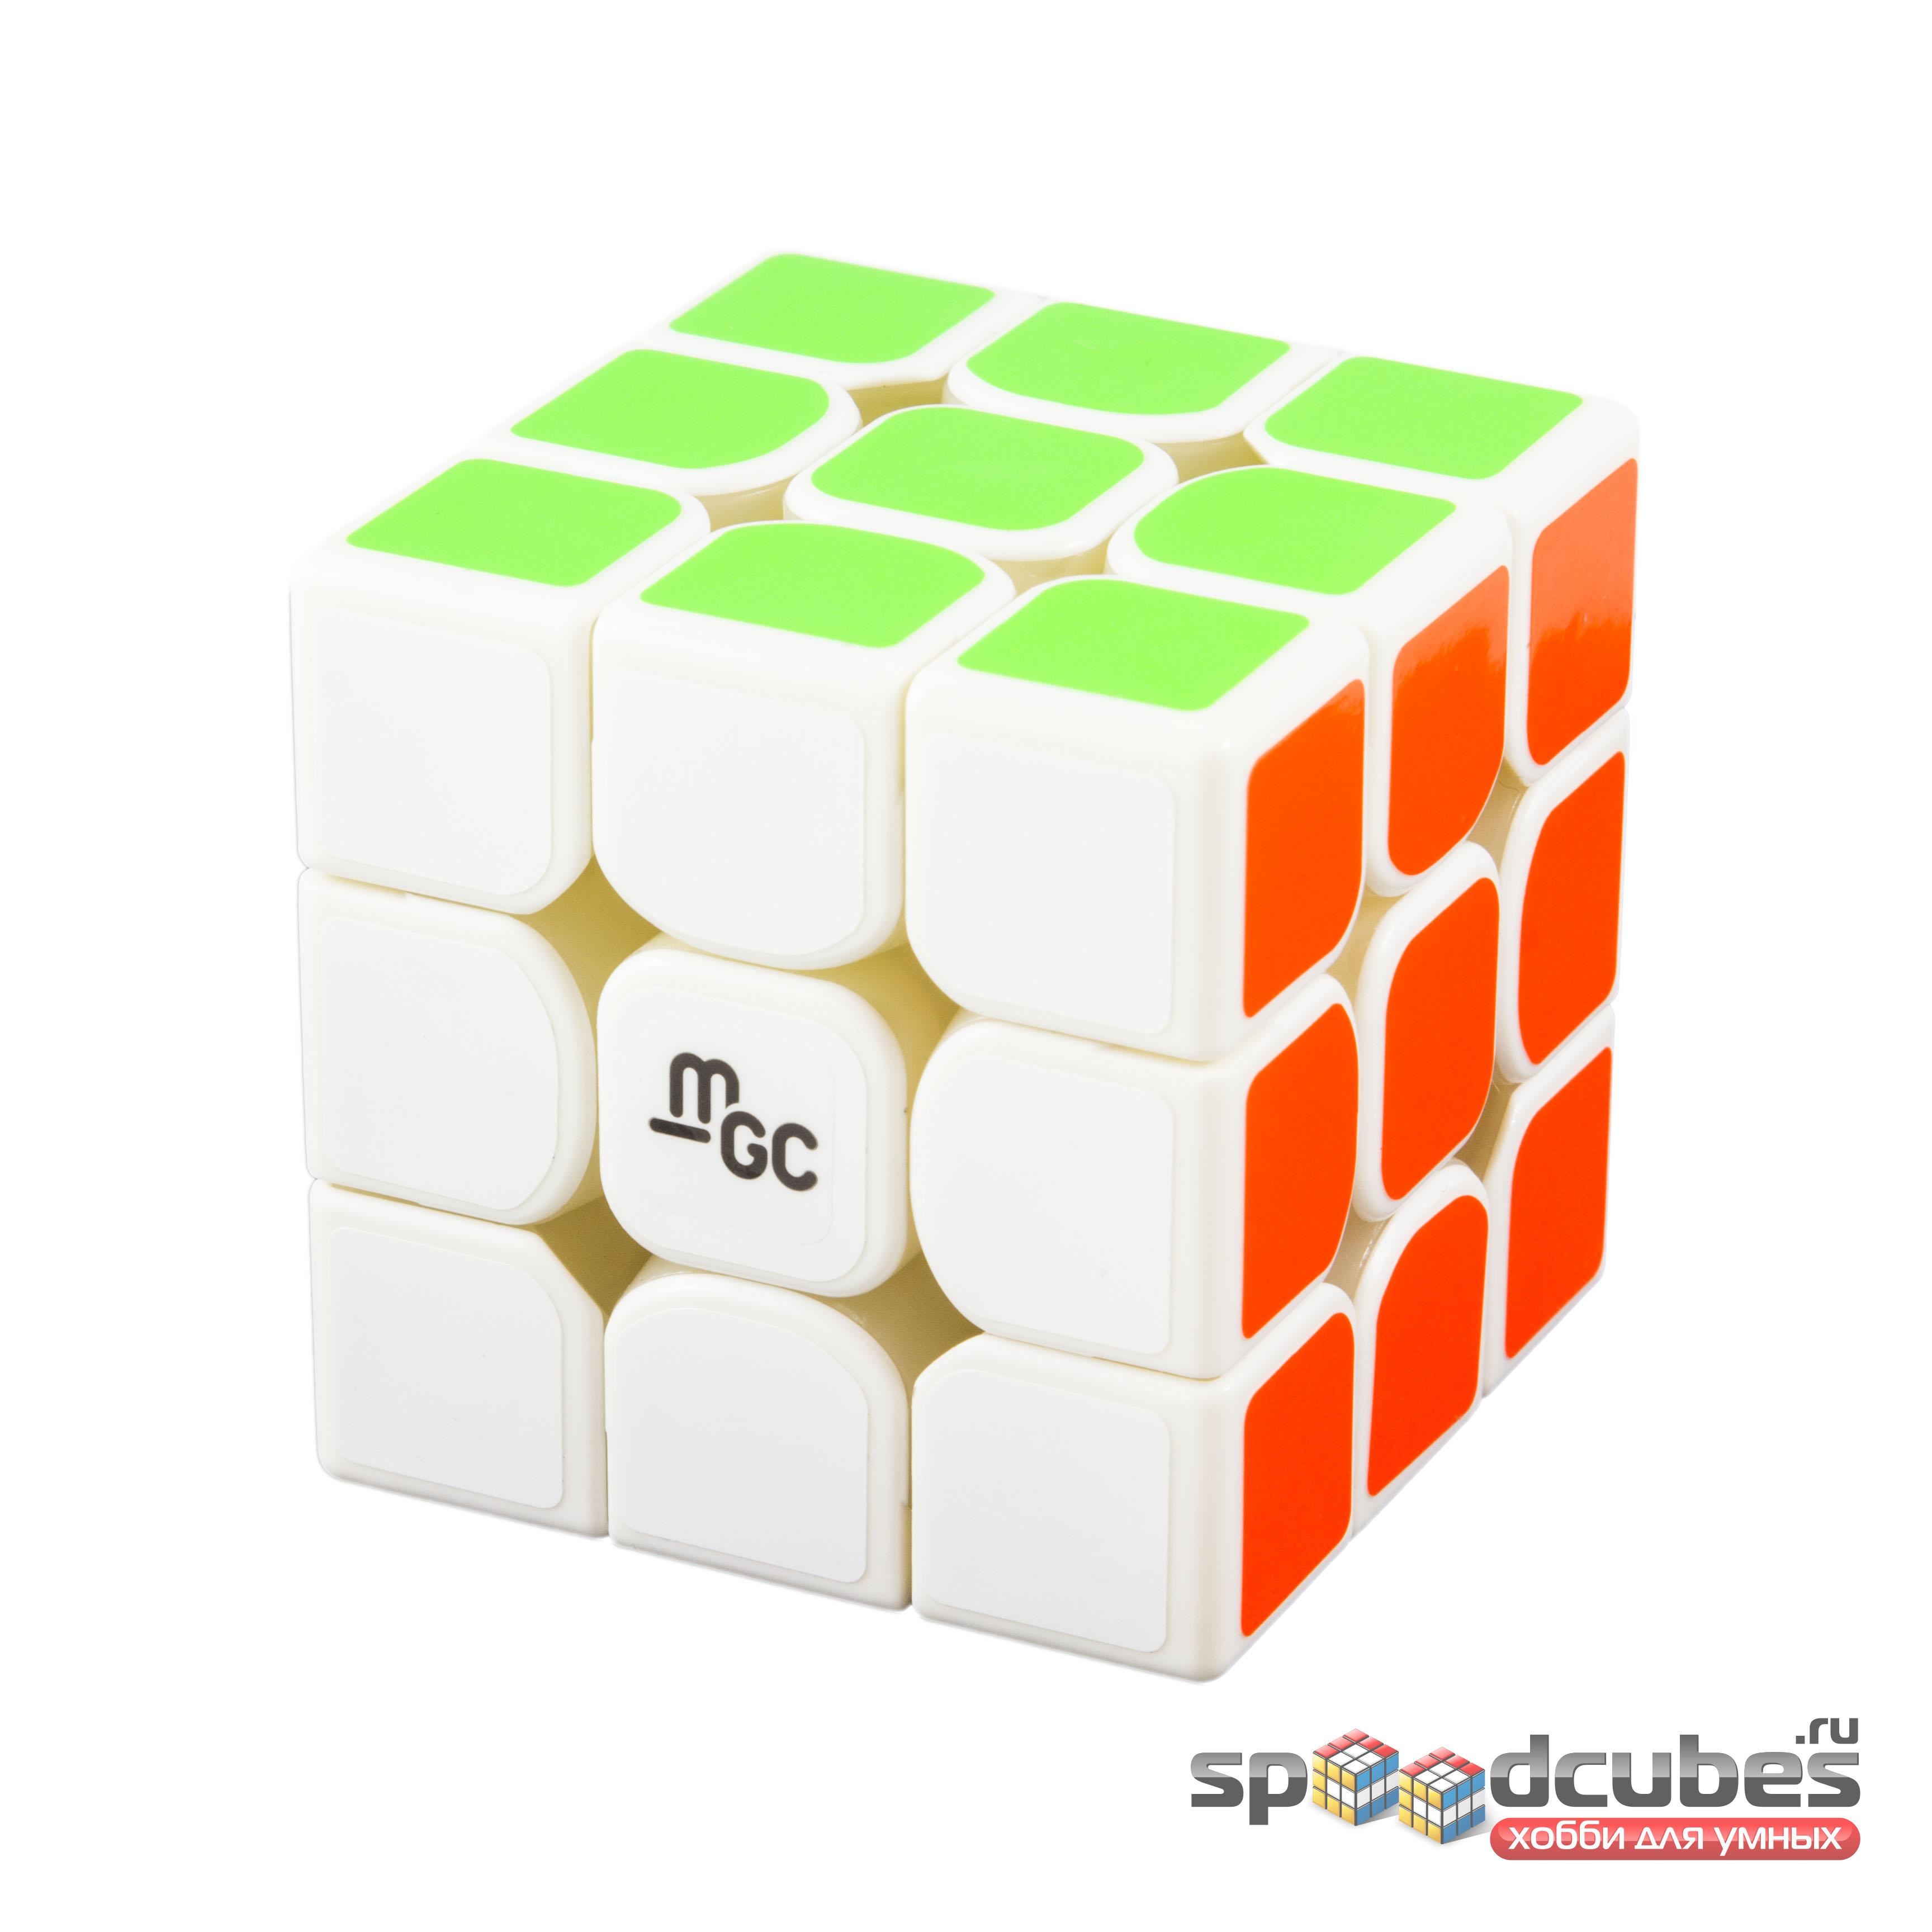 YJ 3x3x3 MGC Magnetic (б)